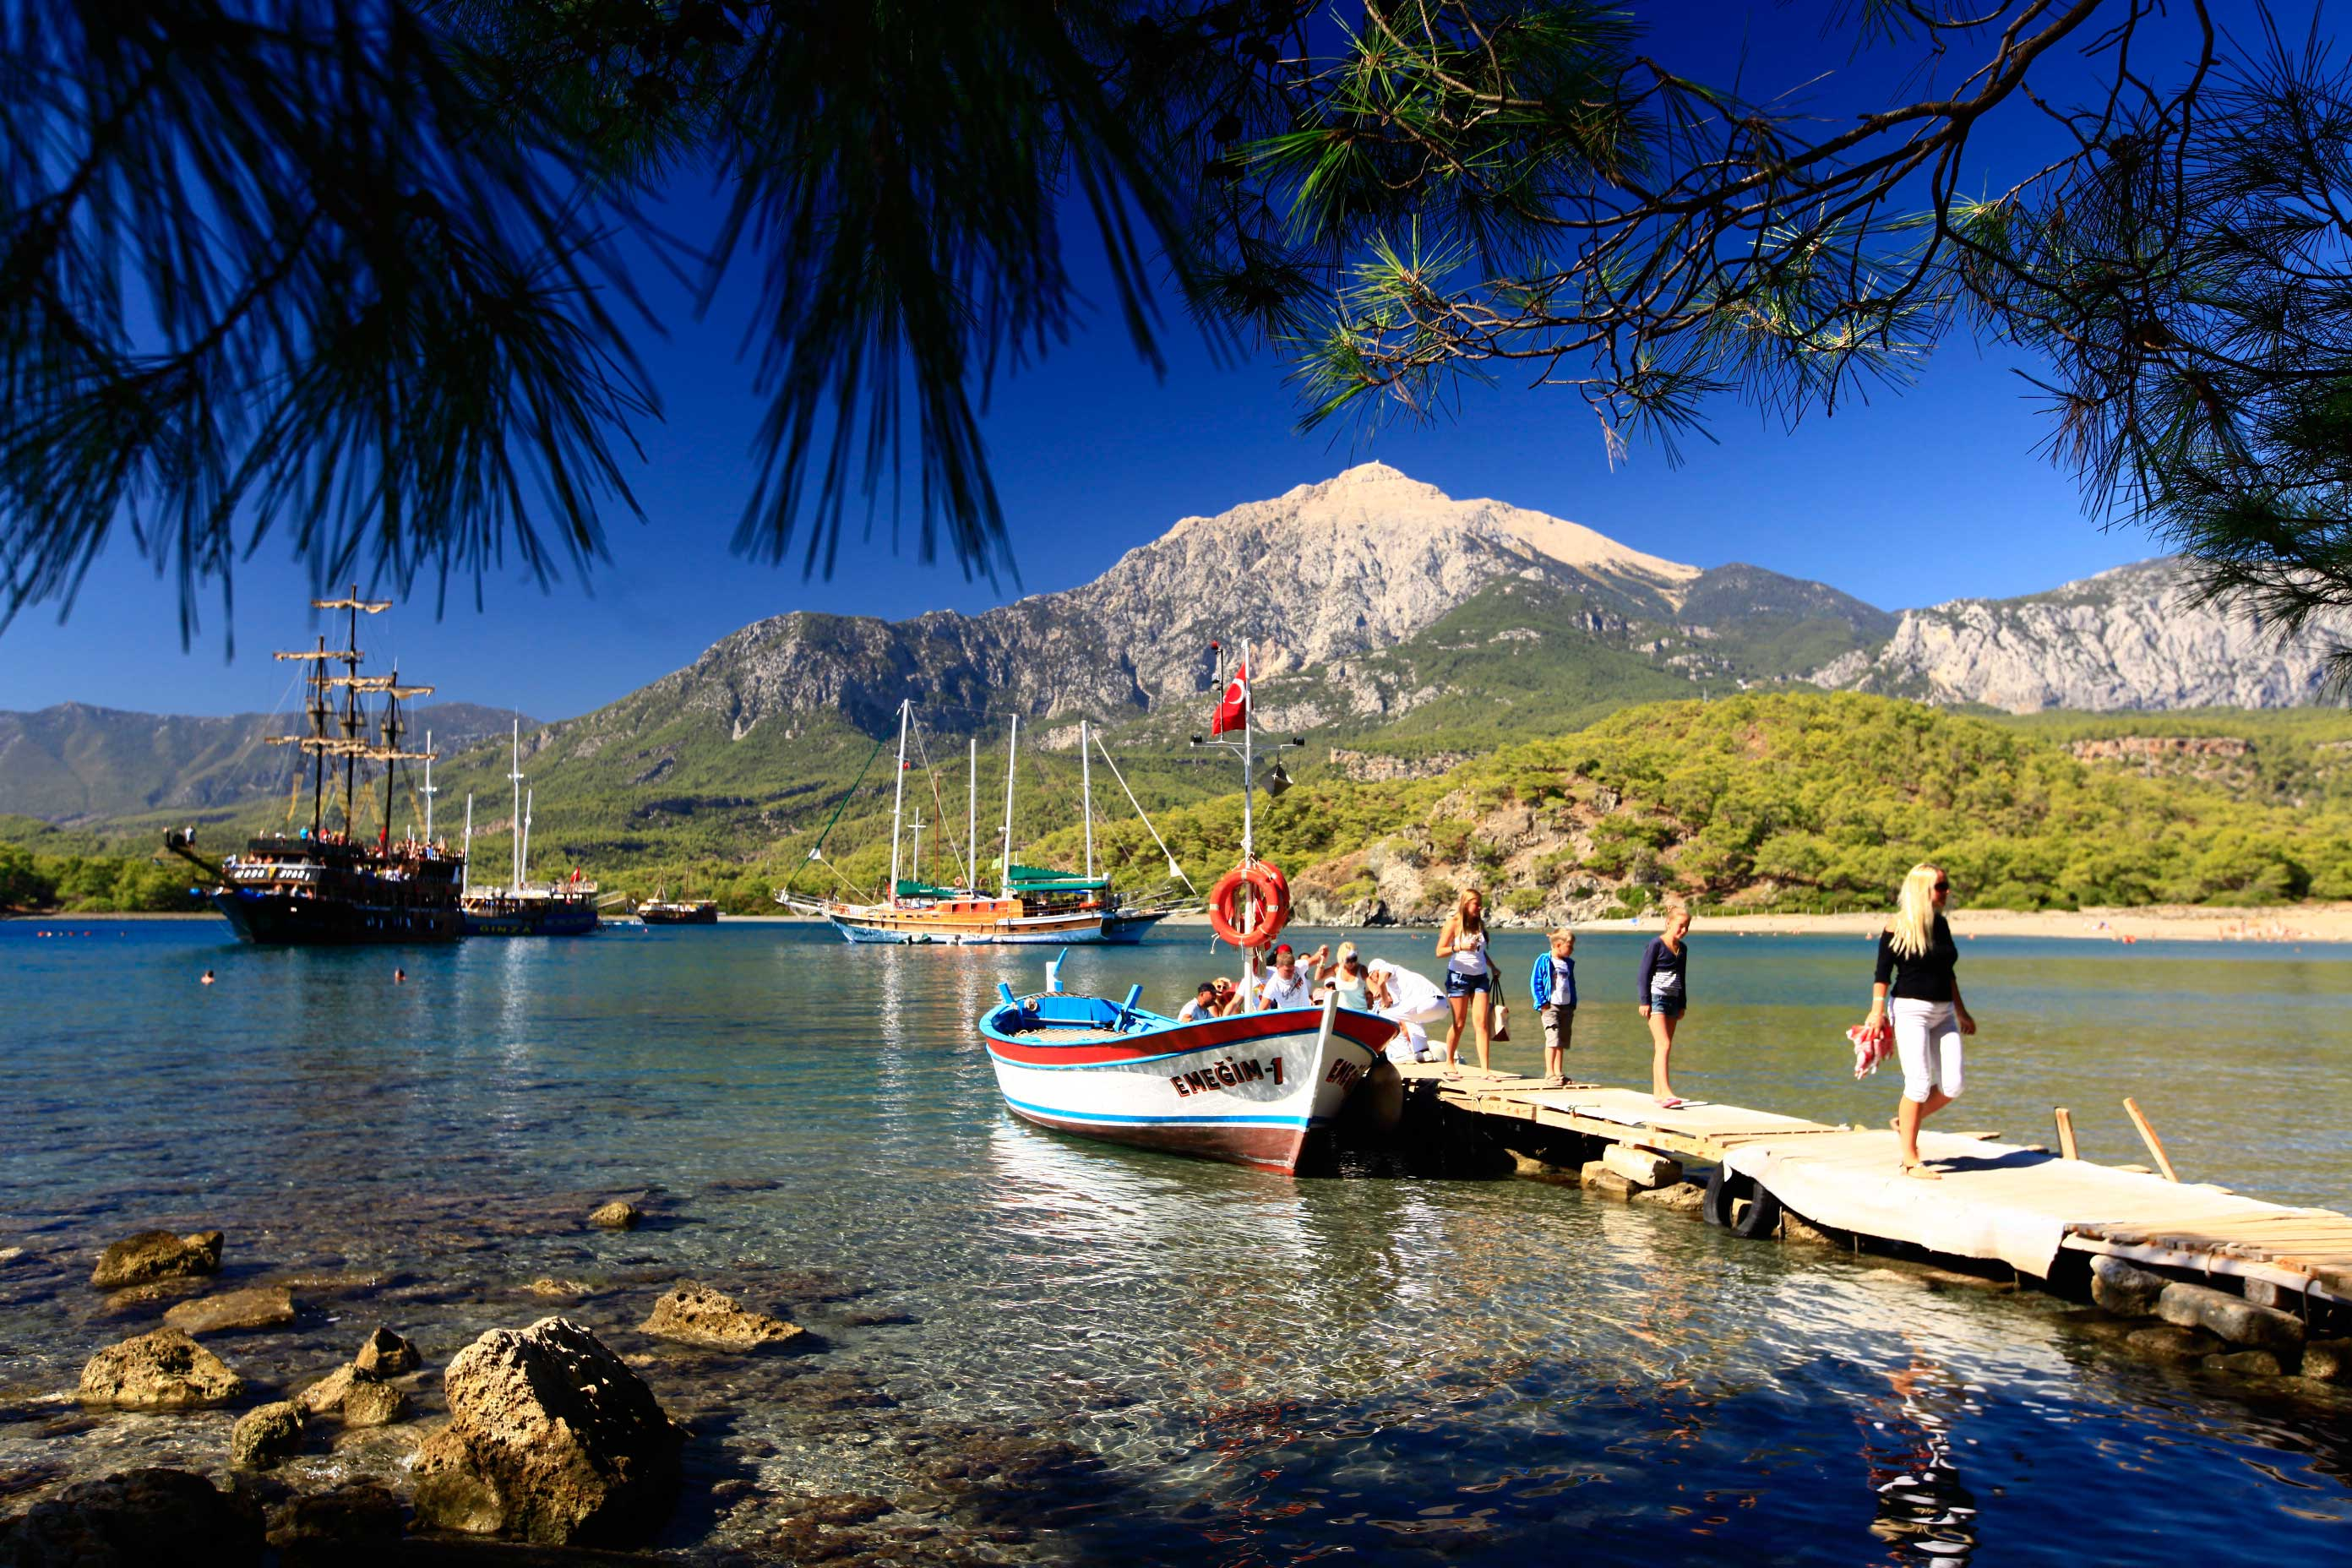 Phaselis Tekne Gezisi - Kemer Antalya